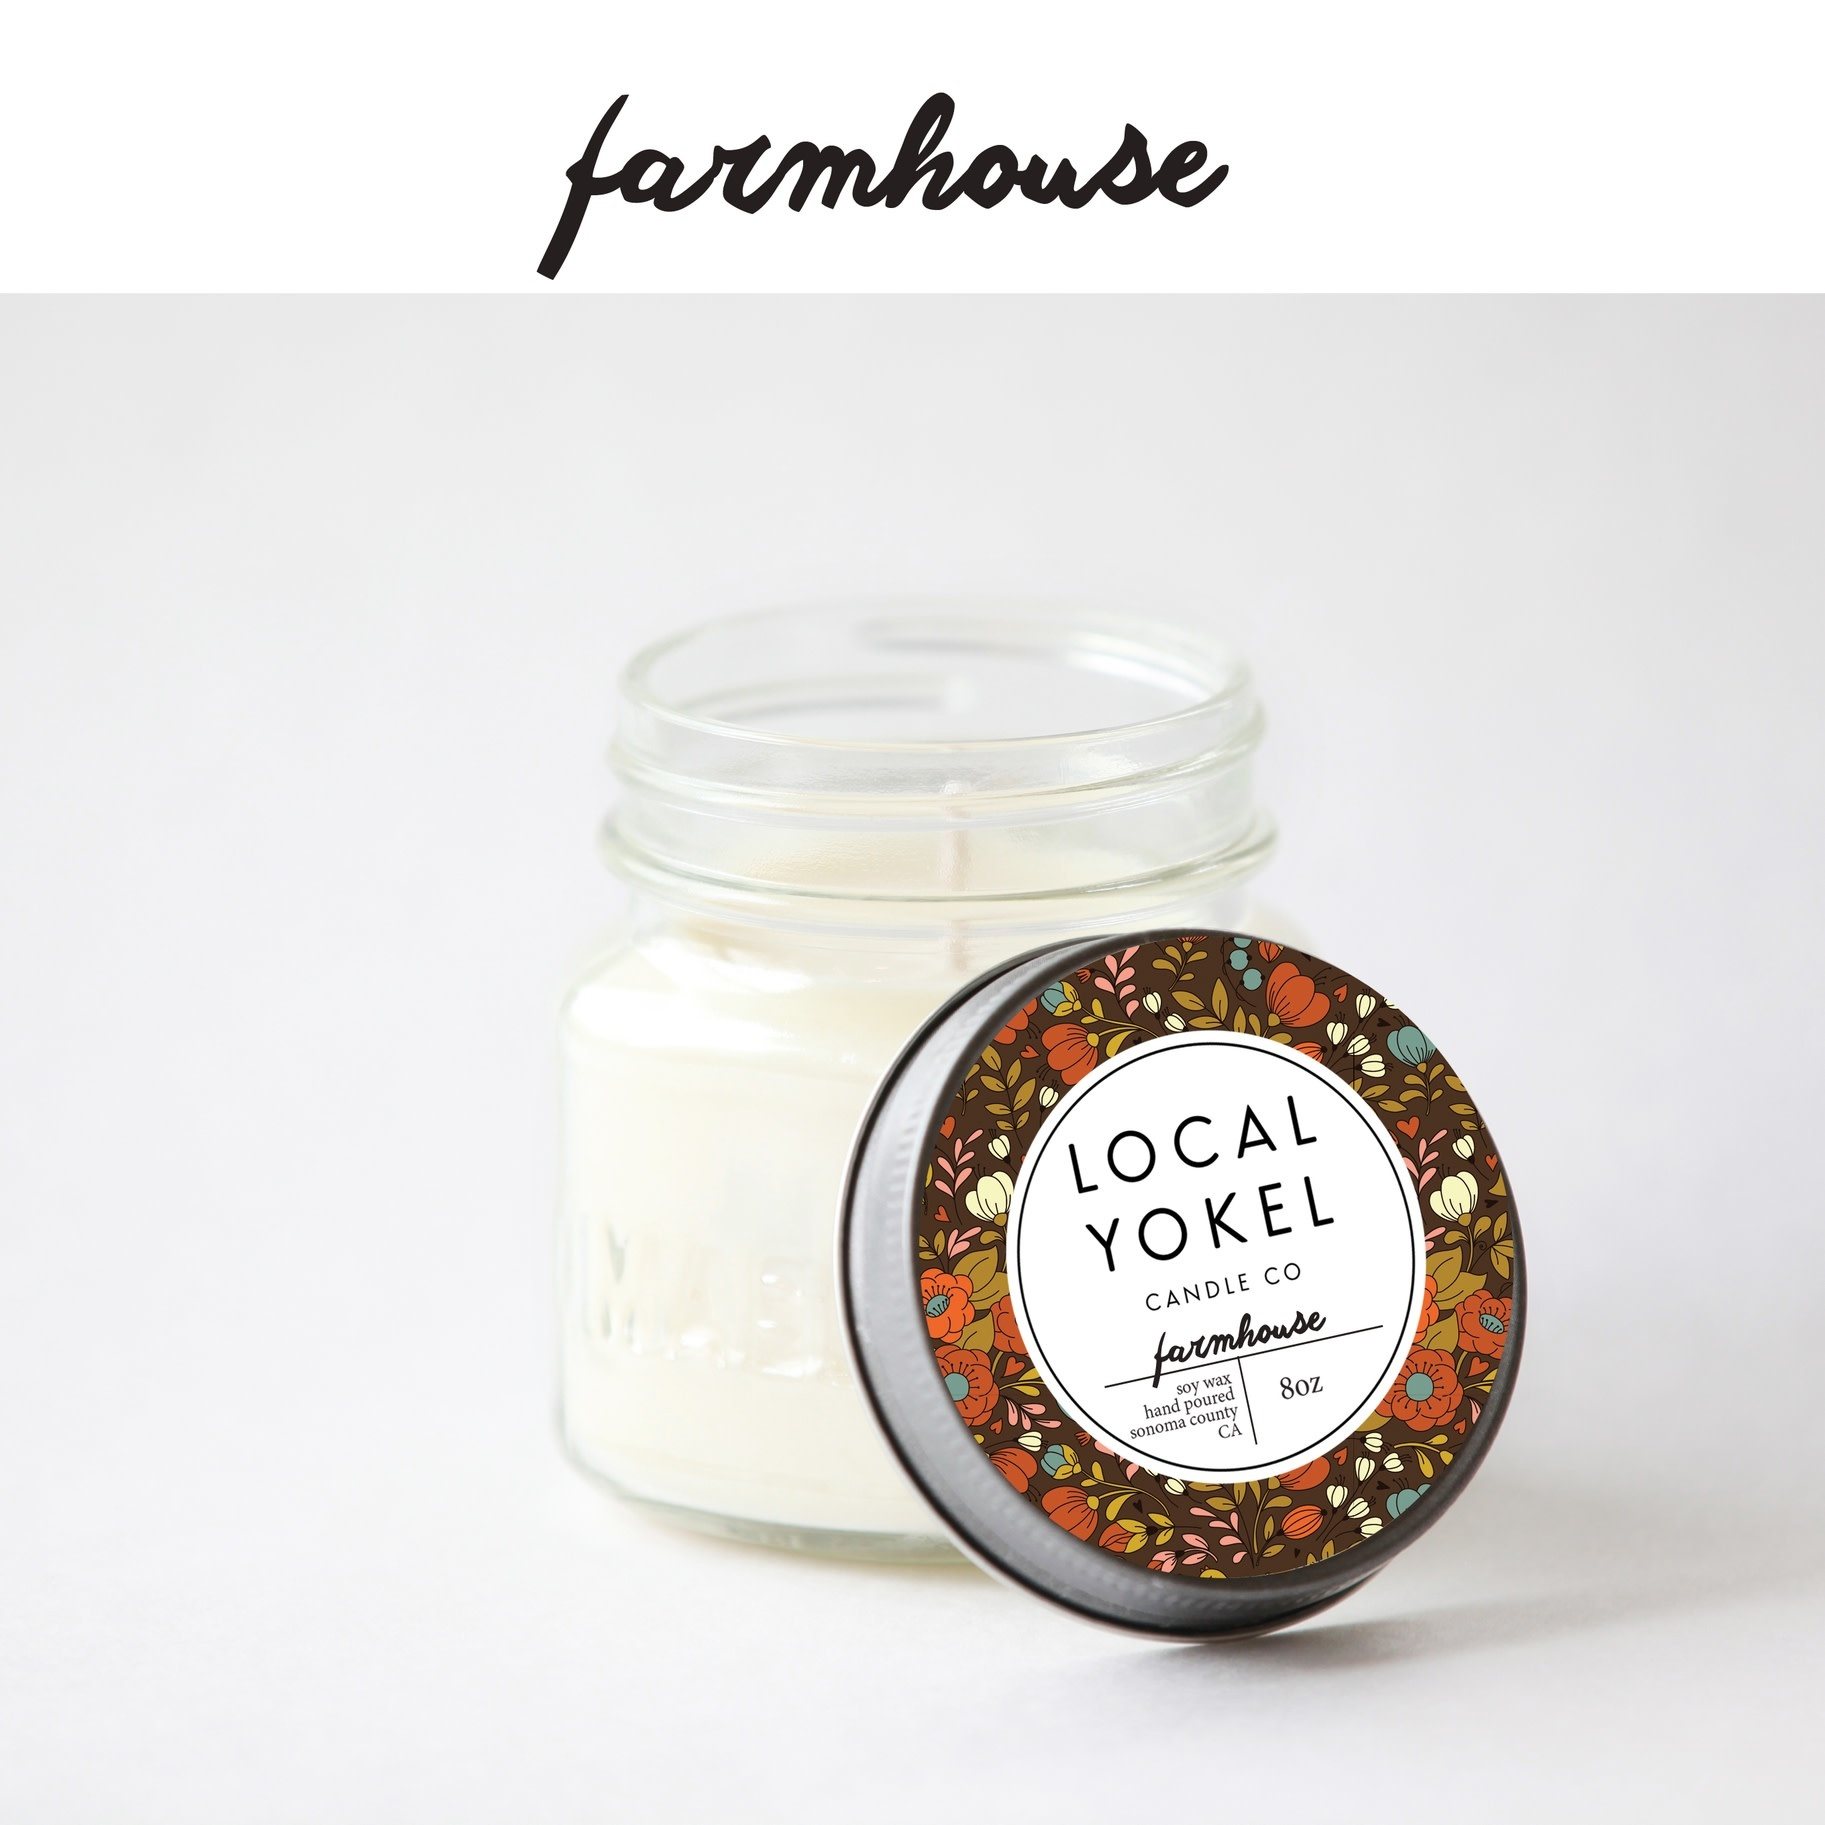 Local Yokel Farmhouse Candle 8oz